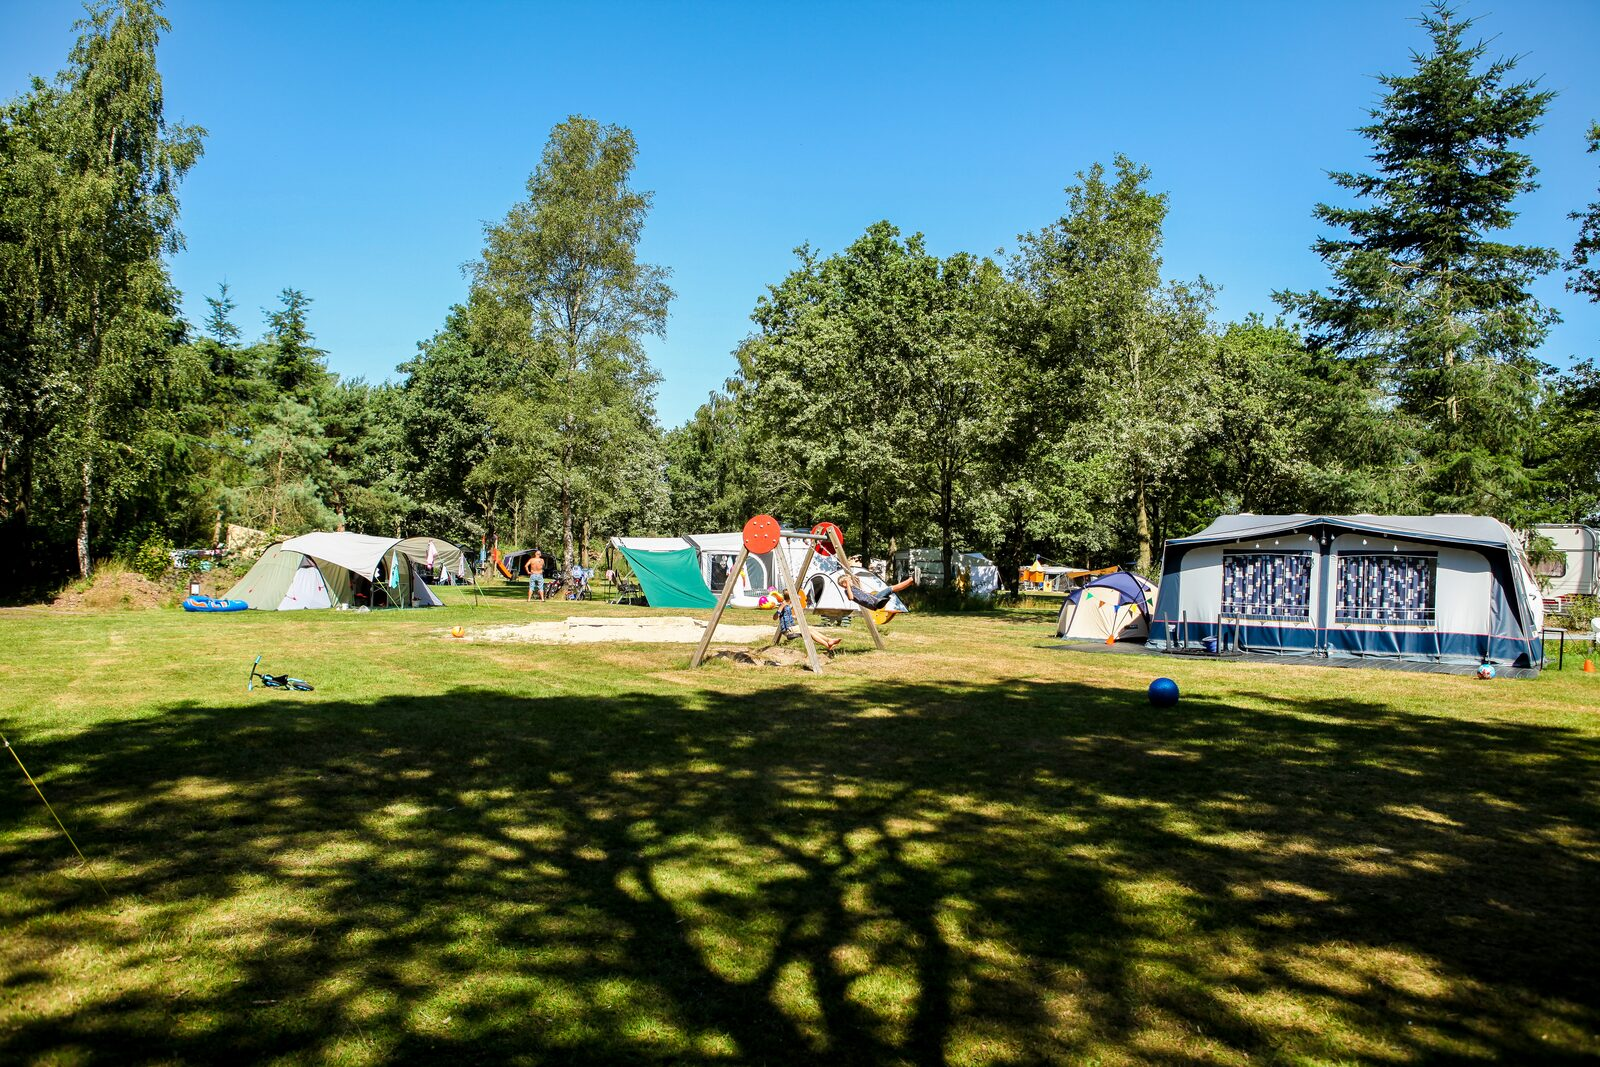 Camping Grolloo